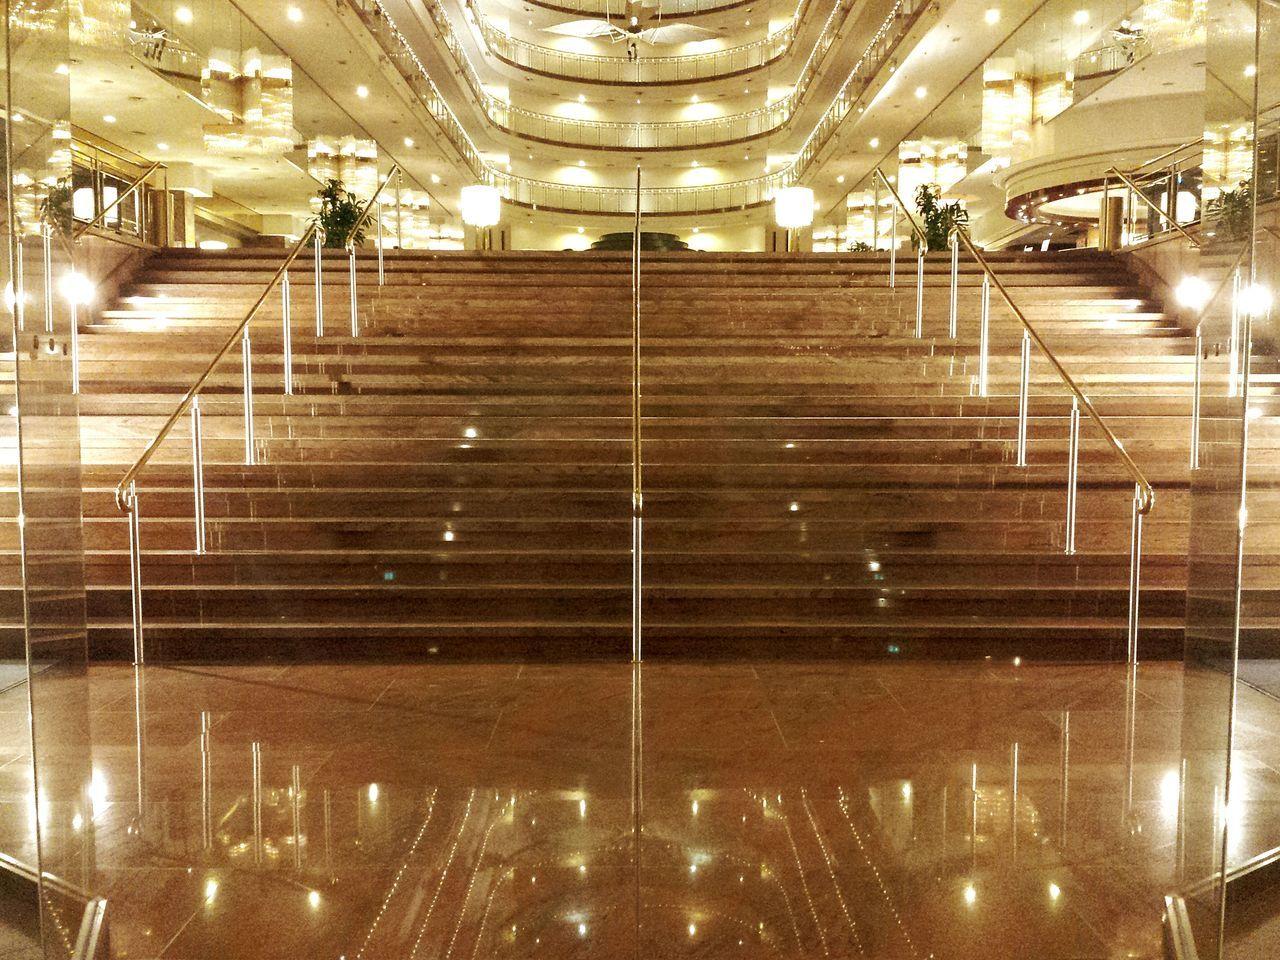 Entrance Hall View From Below From Below Marmor Treppe Spiegelungen im Marmor Stairs Prachtvoll Prächtiger Eingangsbereich Impressive View Impressive Locations Ladyphotographerofthemonth